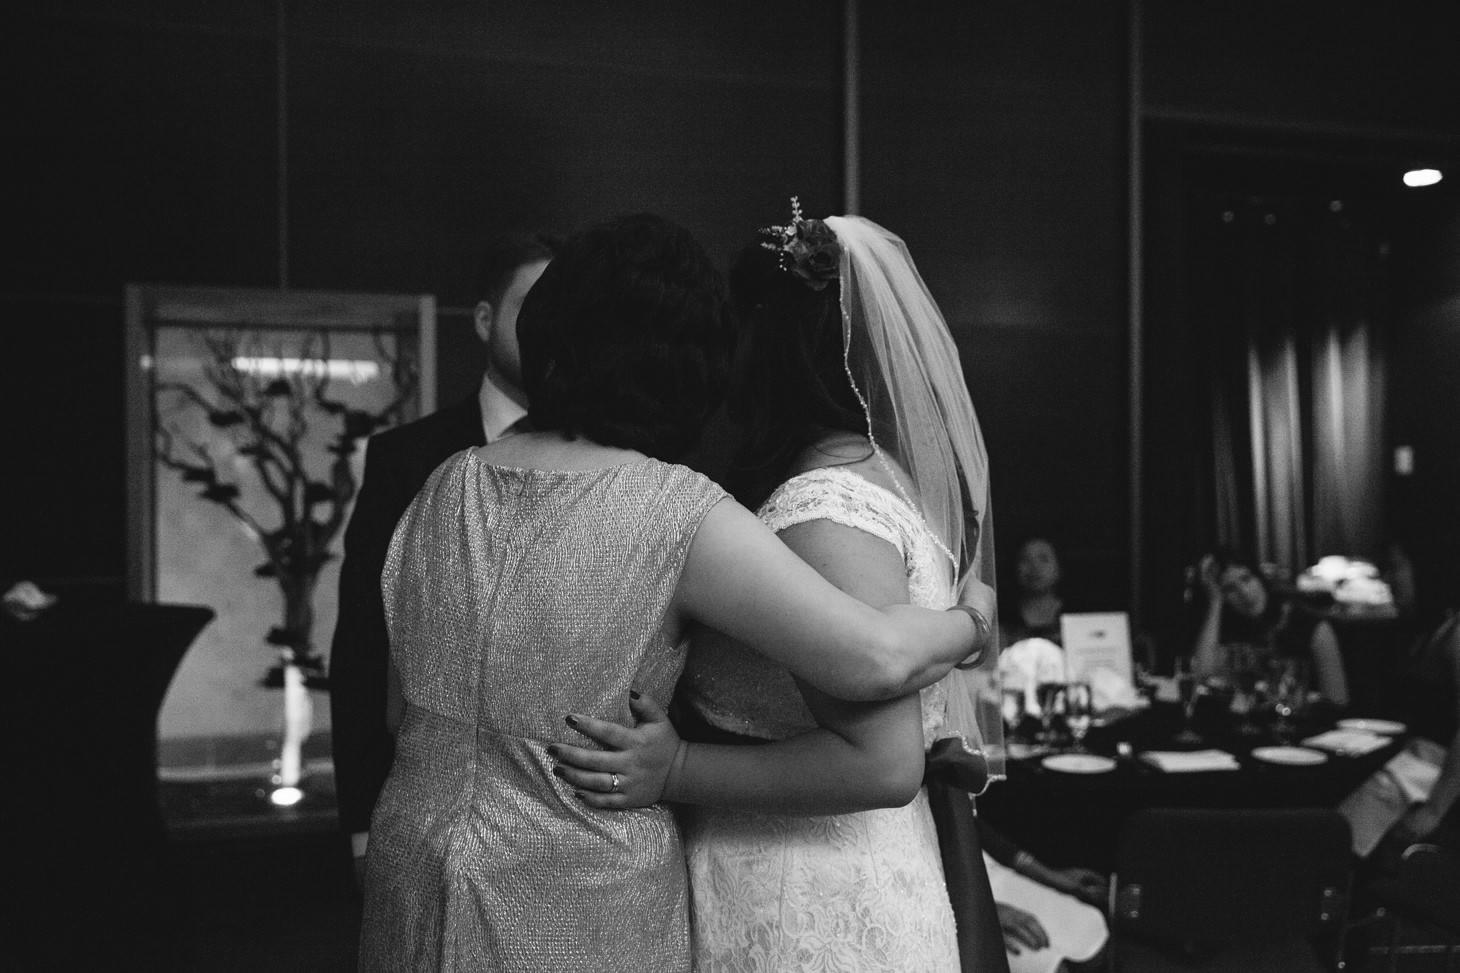 048-nyc-wedding-portrait-photographer-times-square-muse-hotel-winter-wedding-smitten-chickens.jpg